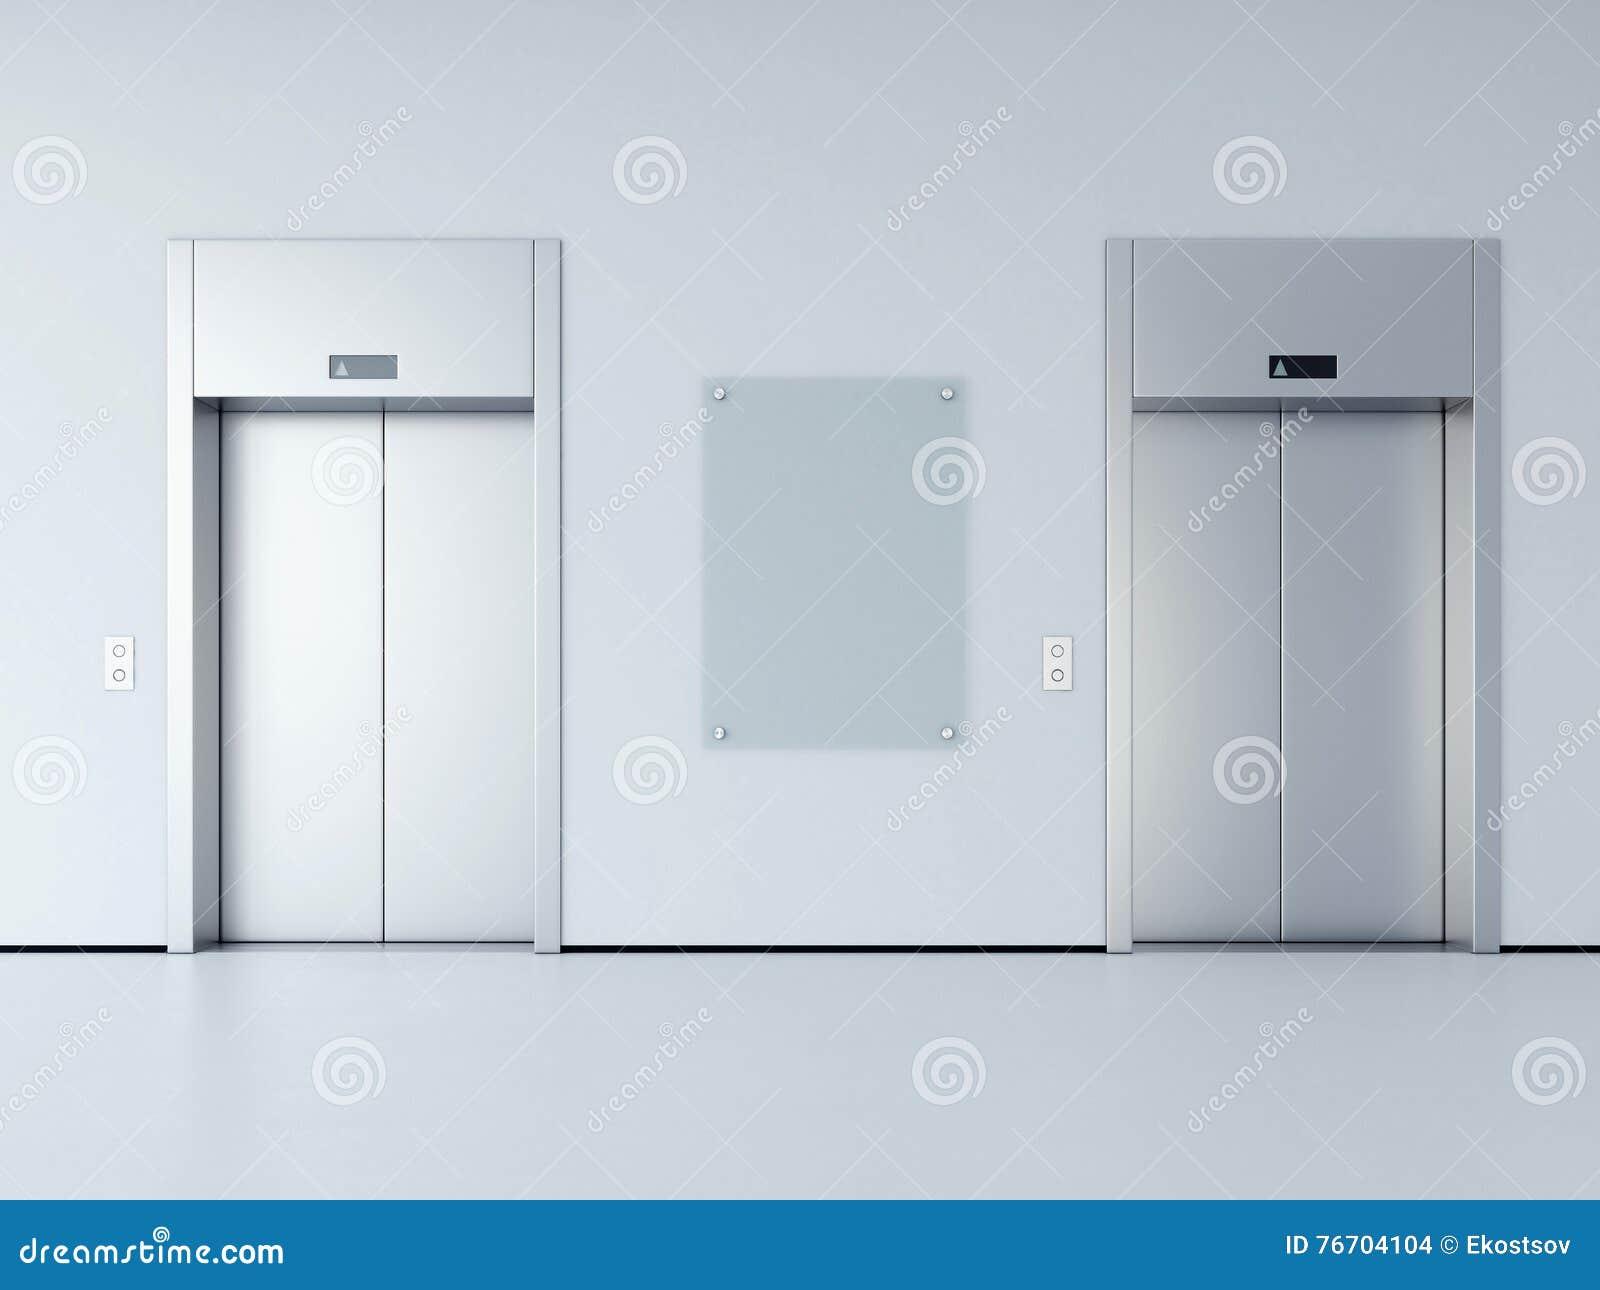 Tom affischtavla i korridoren med två hissar framförande 3d